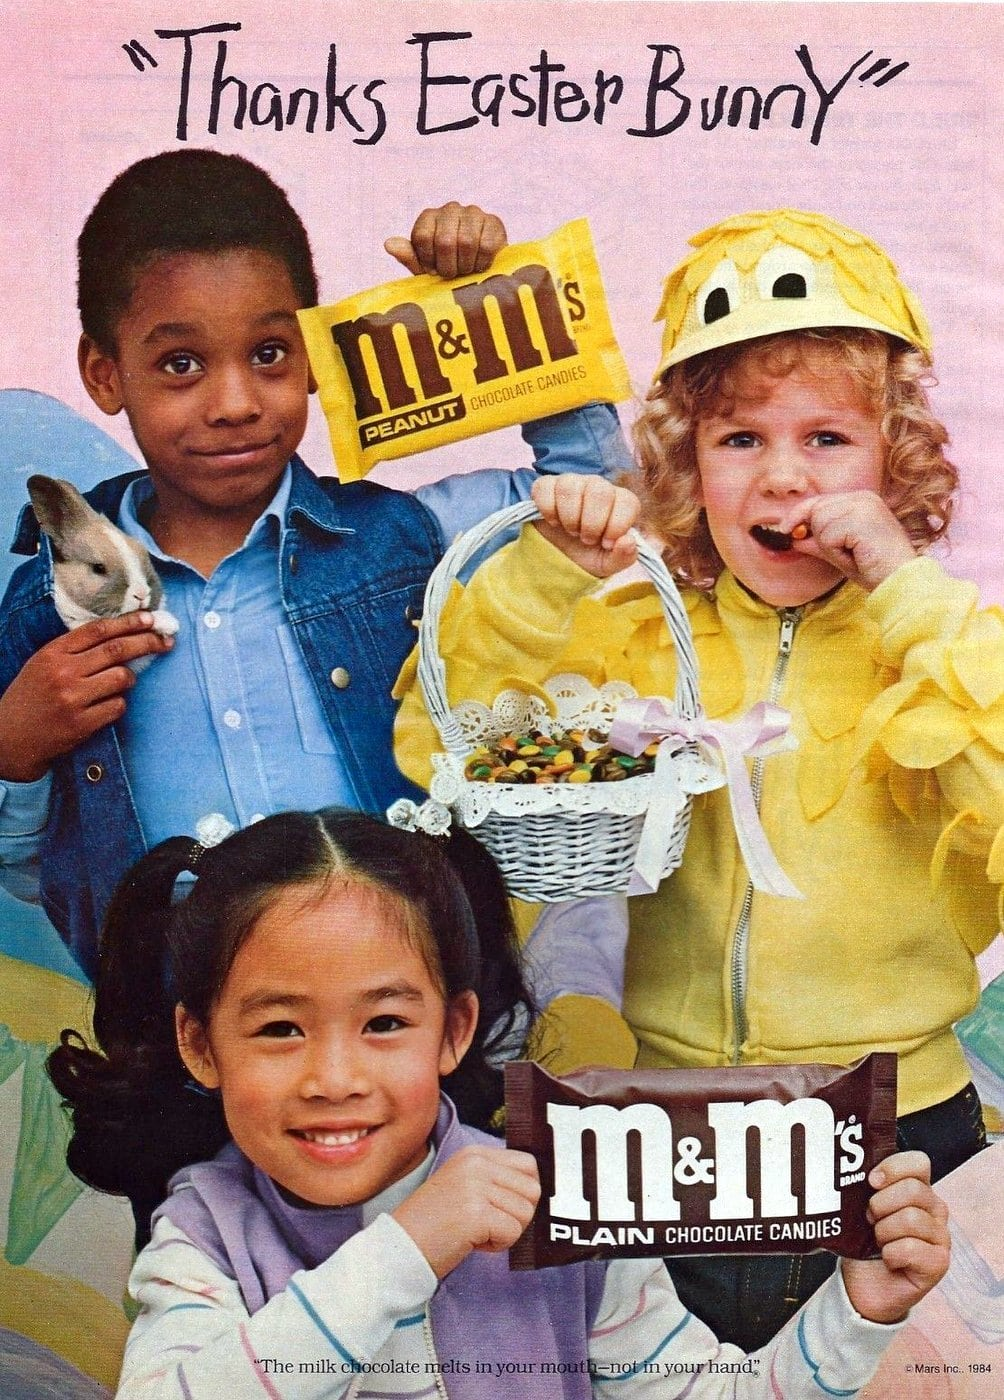 Mars mms for Easter (1984)